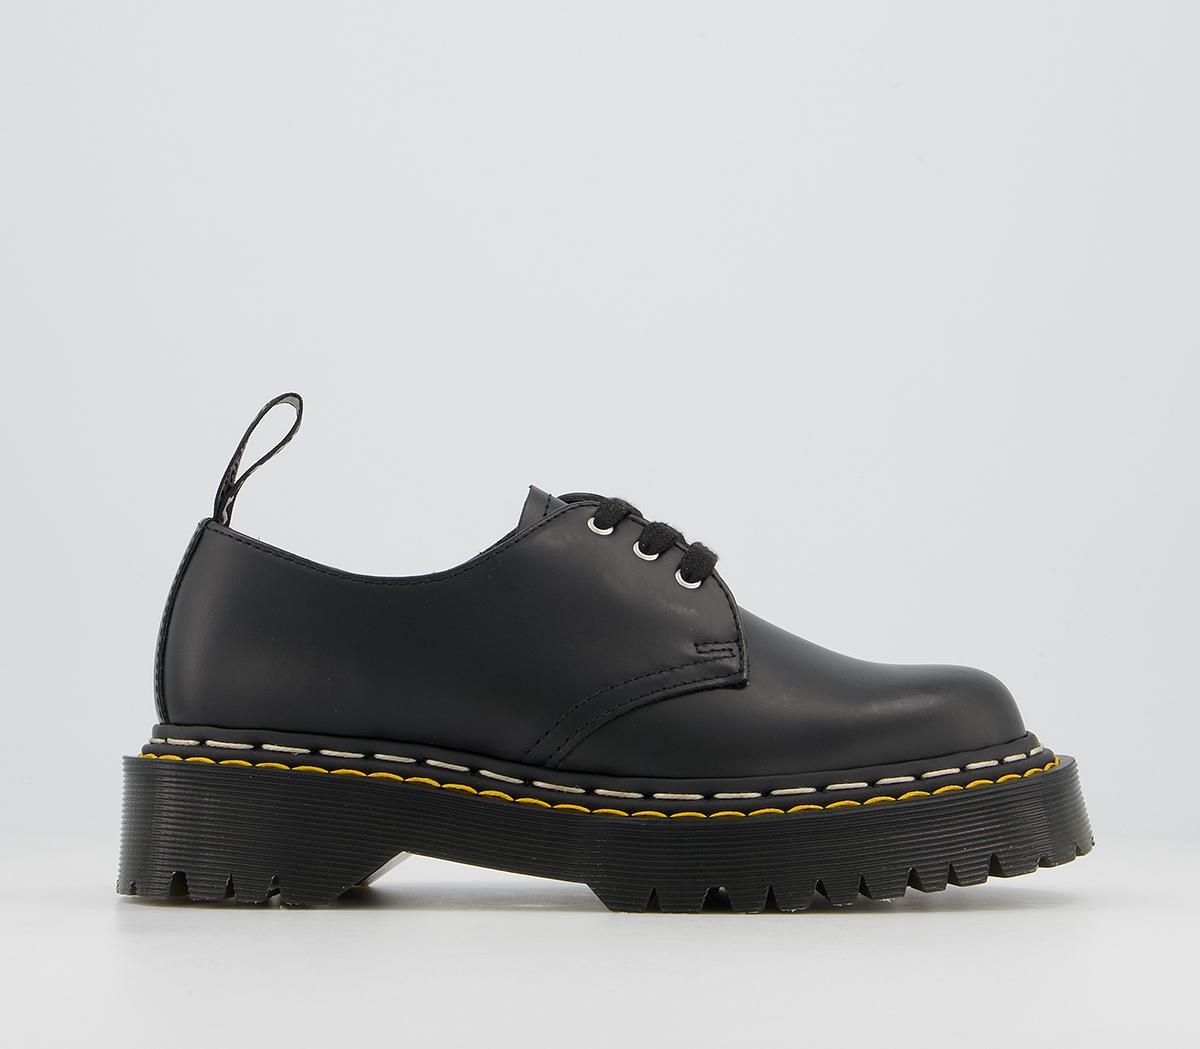 Rick Owens Bex Sole Lace Up Shoes F